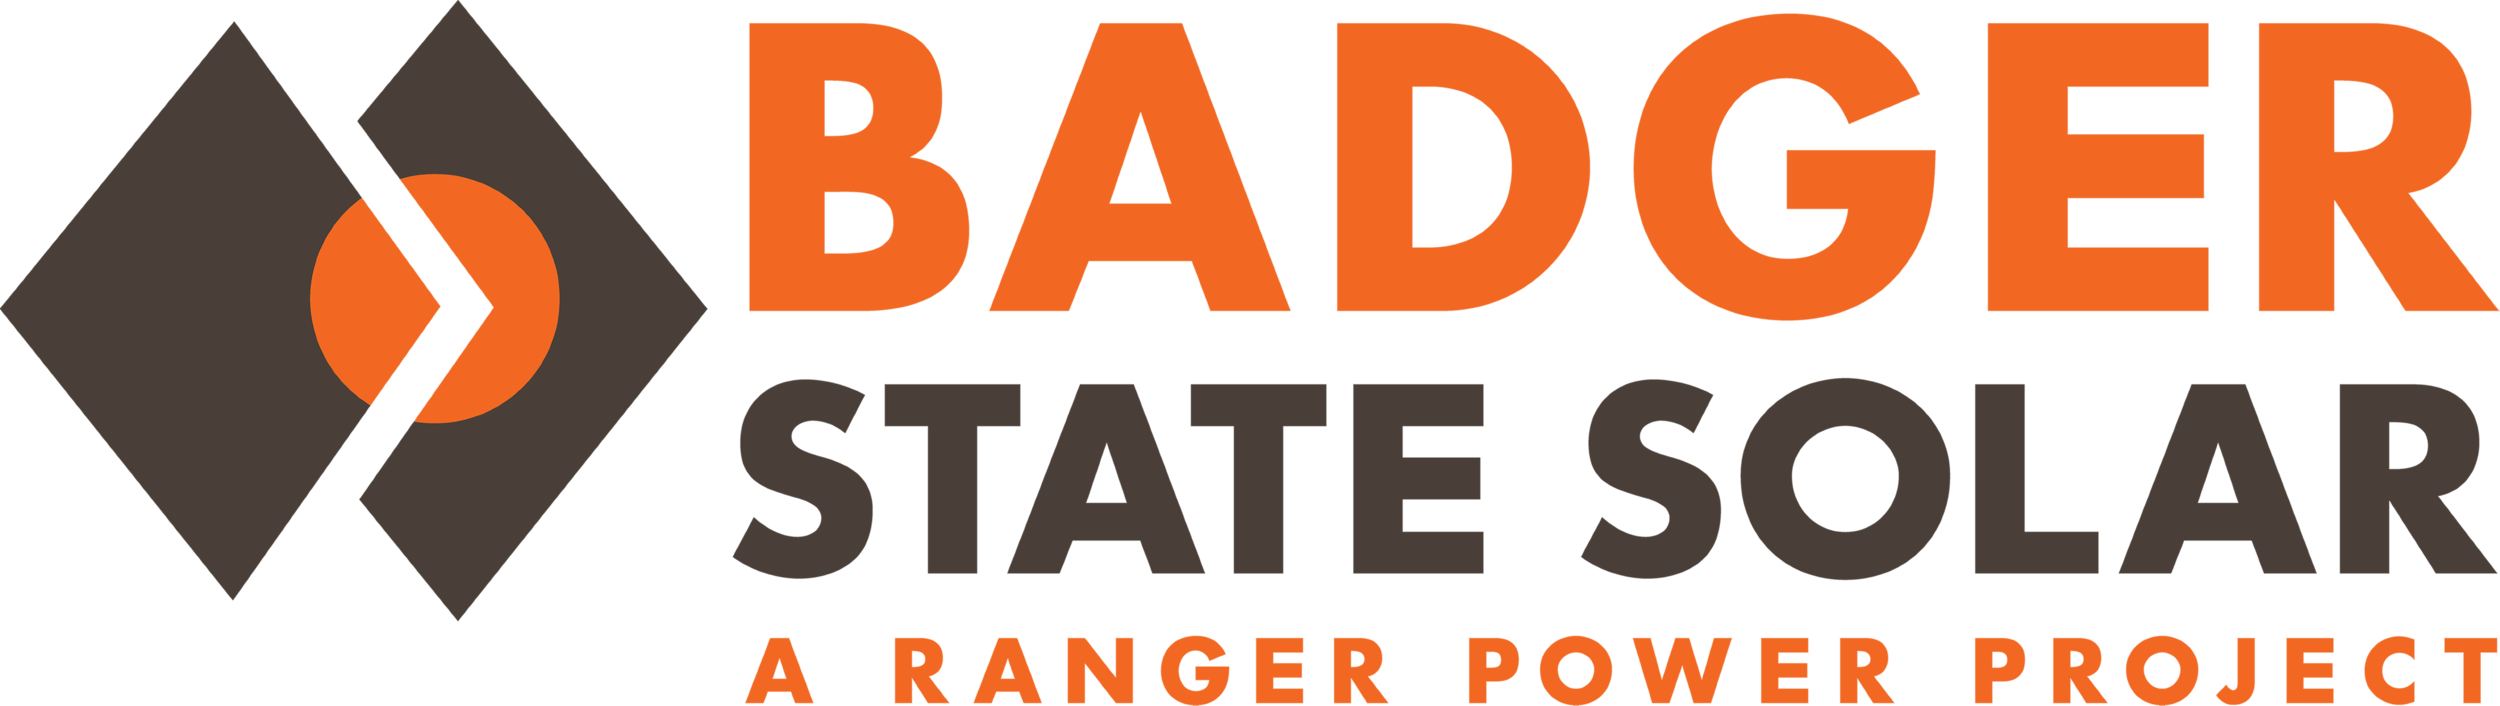 Badger_State_Solar_Large.png